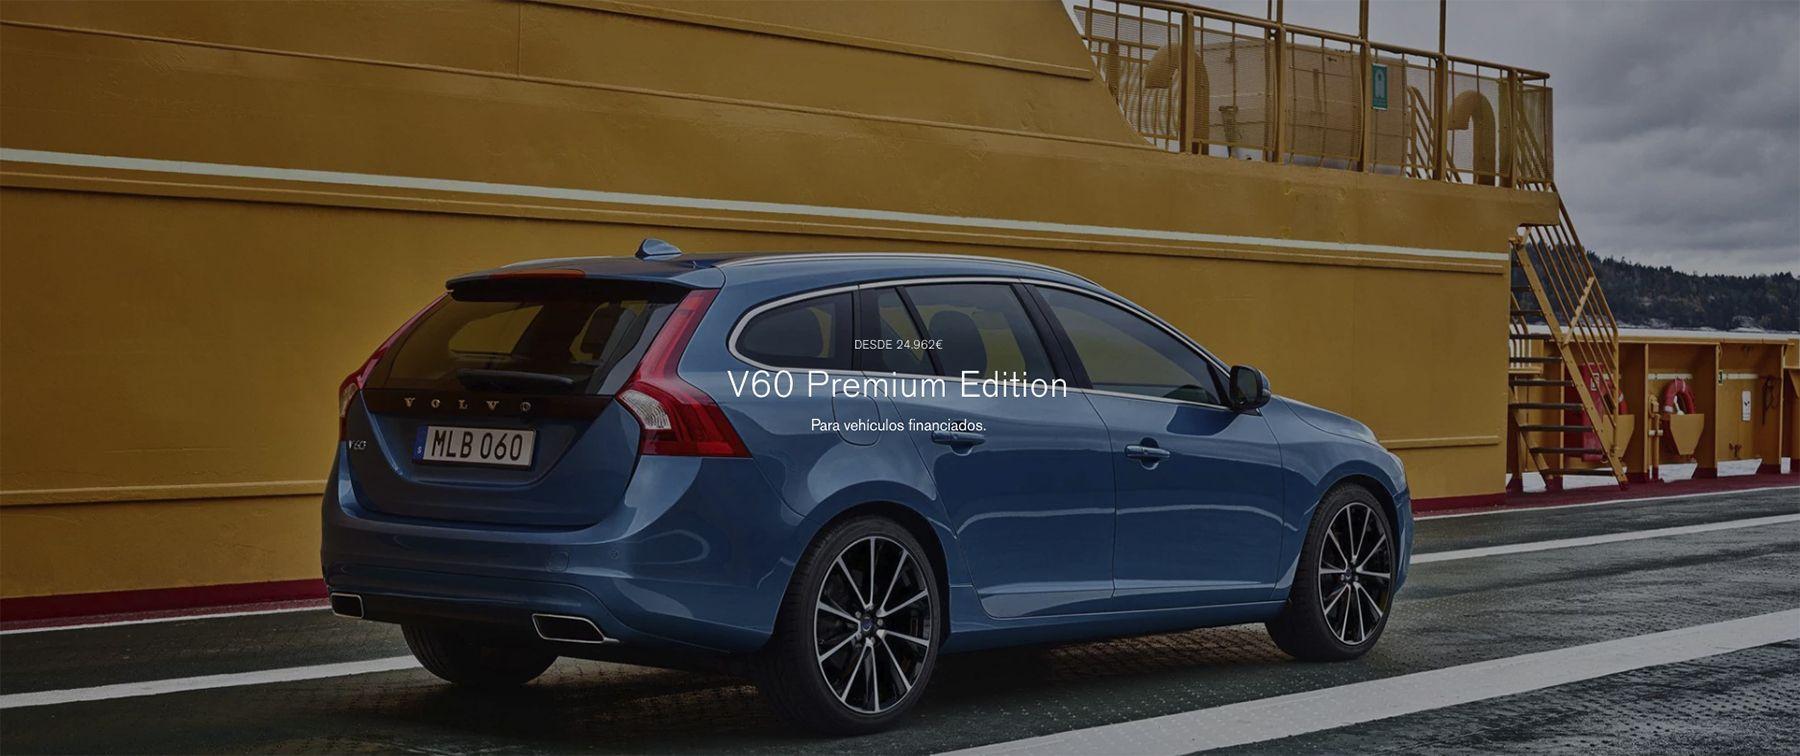 V60 Premium Edition desde 24.962€